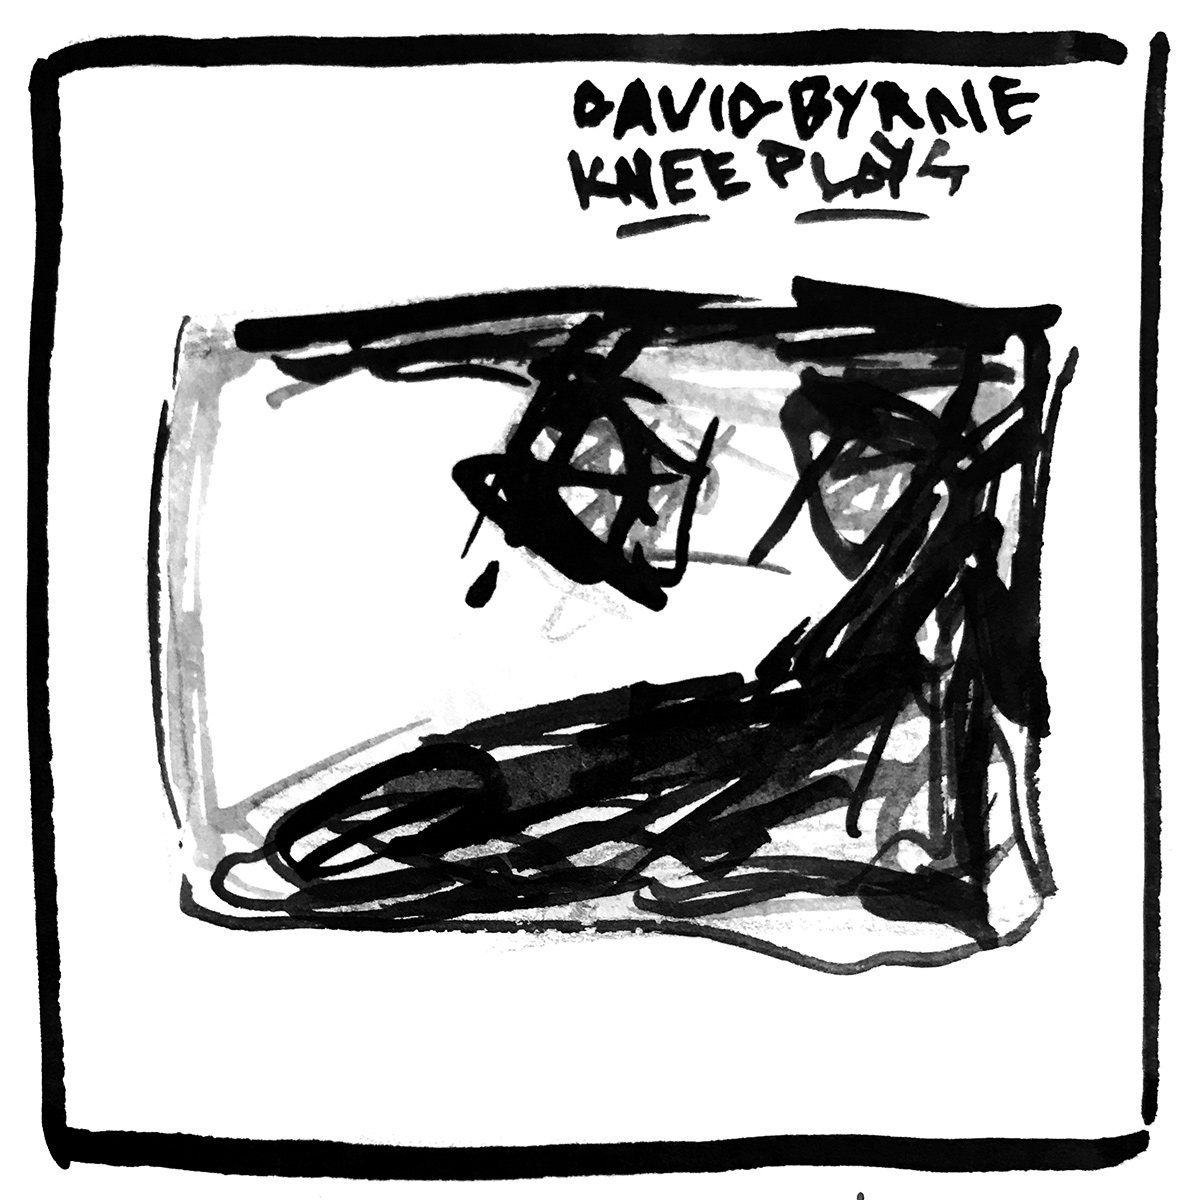 David Byrne Knee Plays